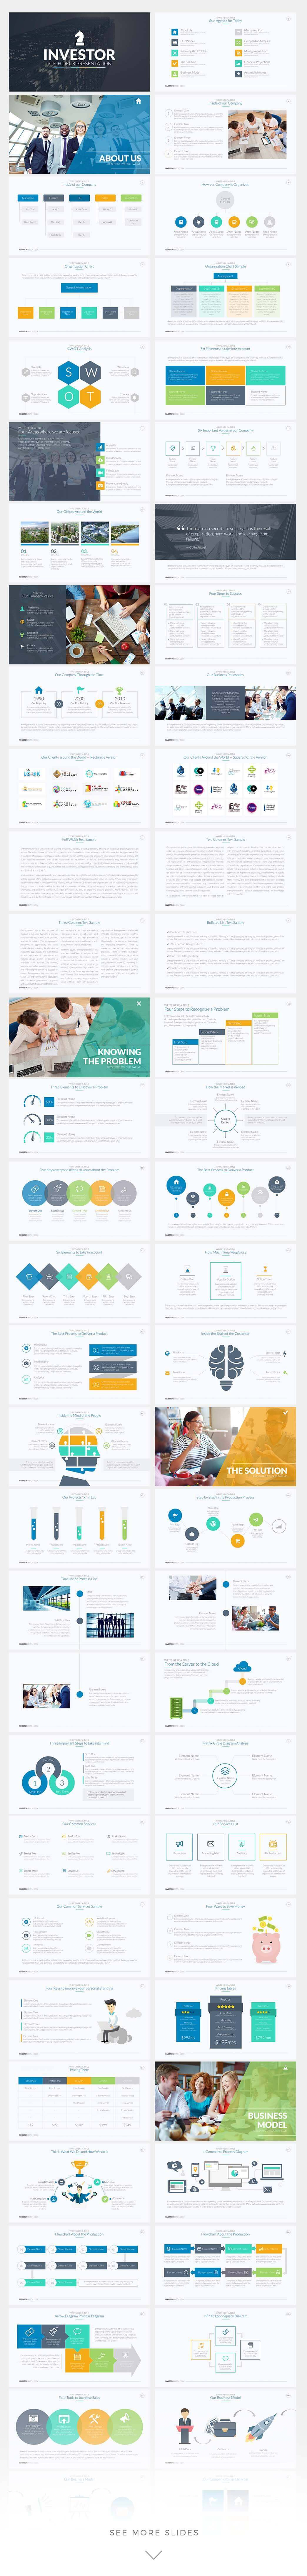 investor pro powerpoint templates